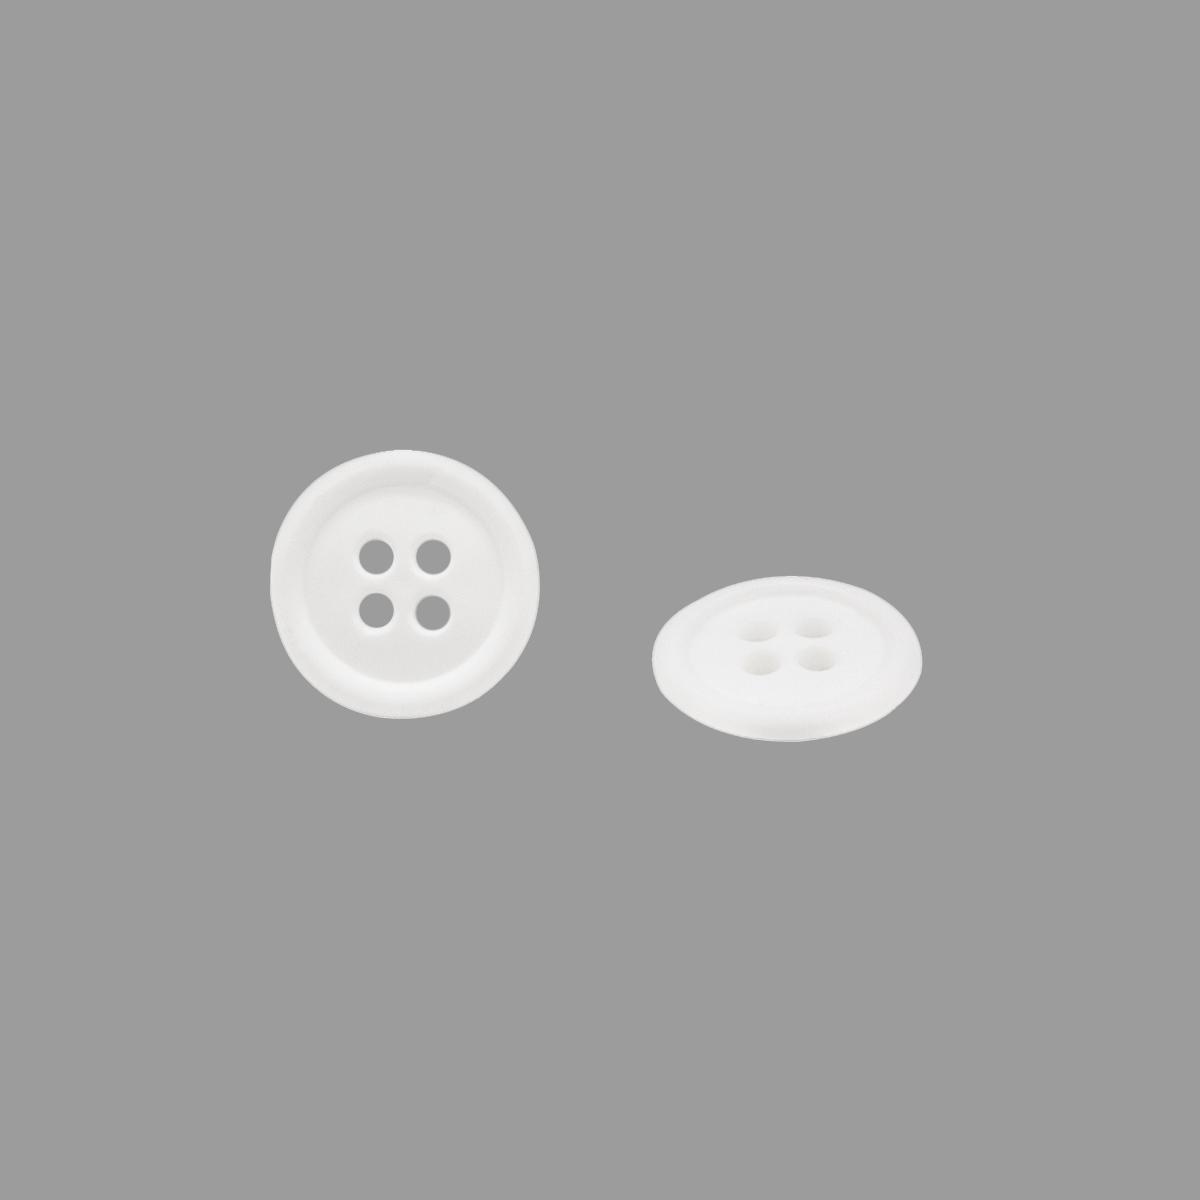 КЛ14-4 Пуговица 4 пр., белый, 14 мм